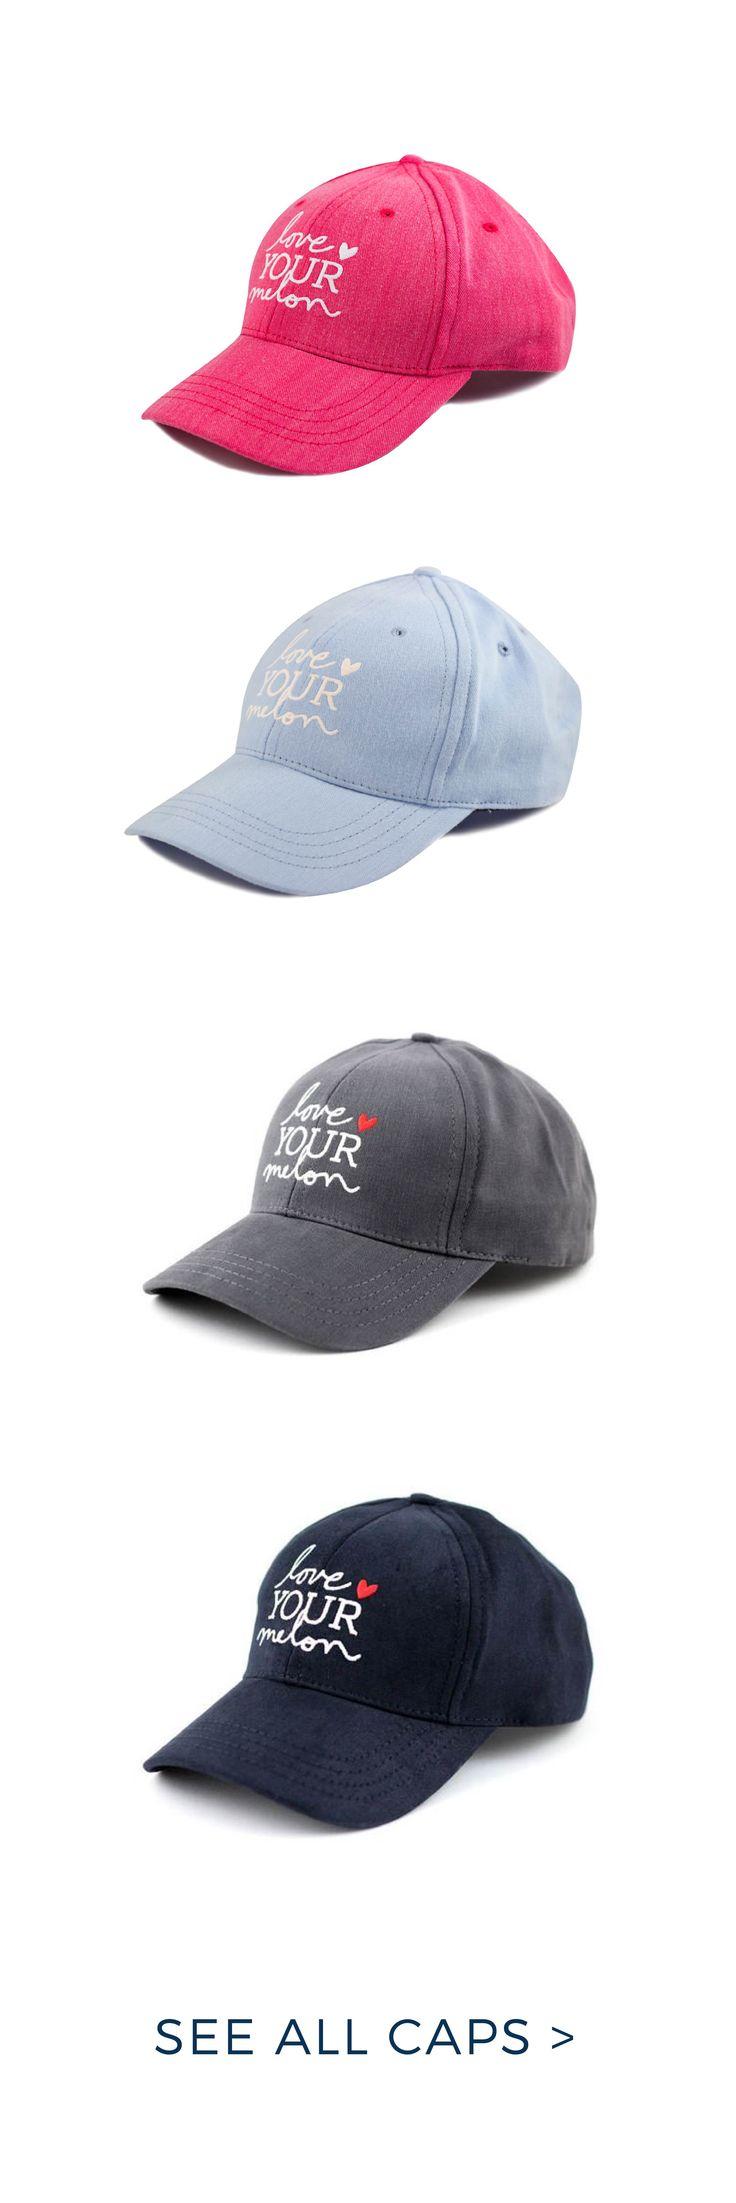 Shop Love Your Melon Caps that give back!